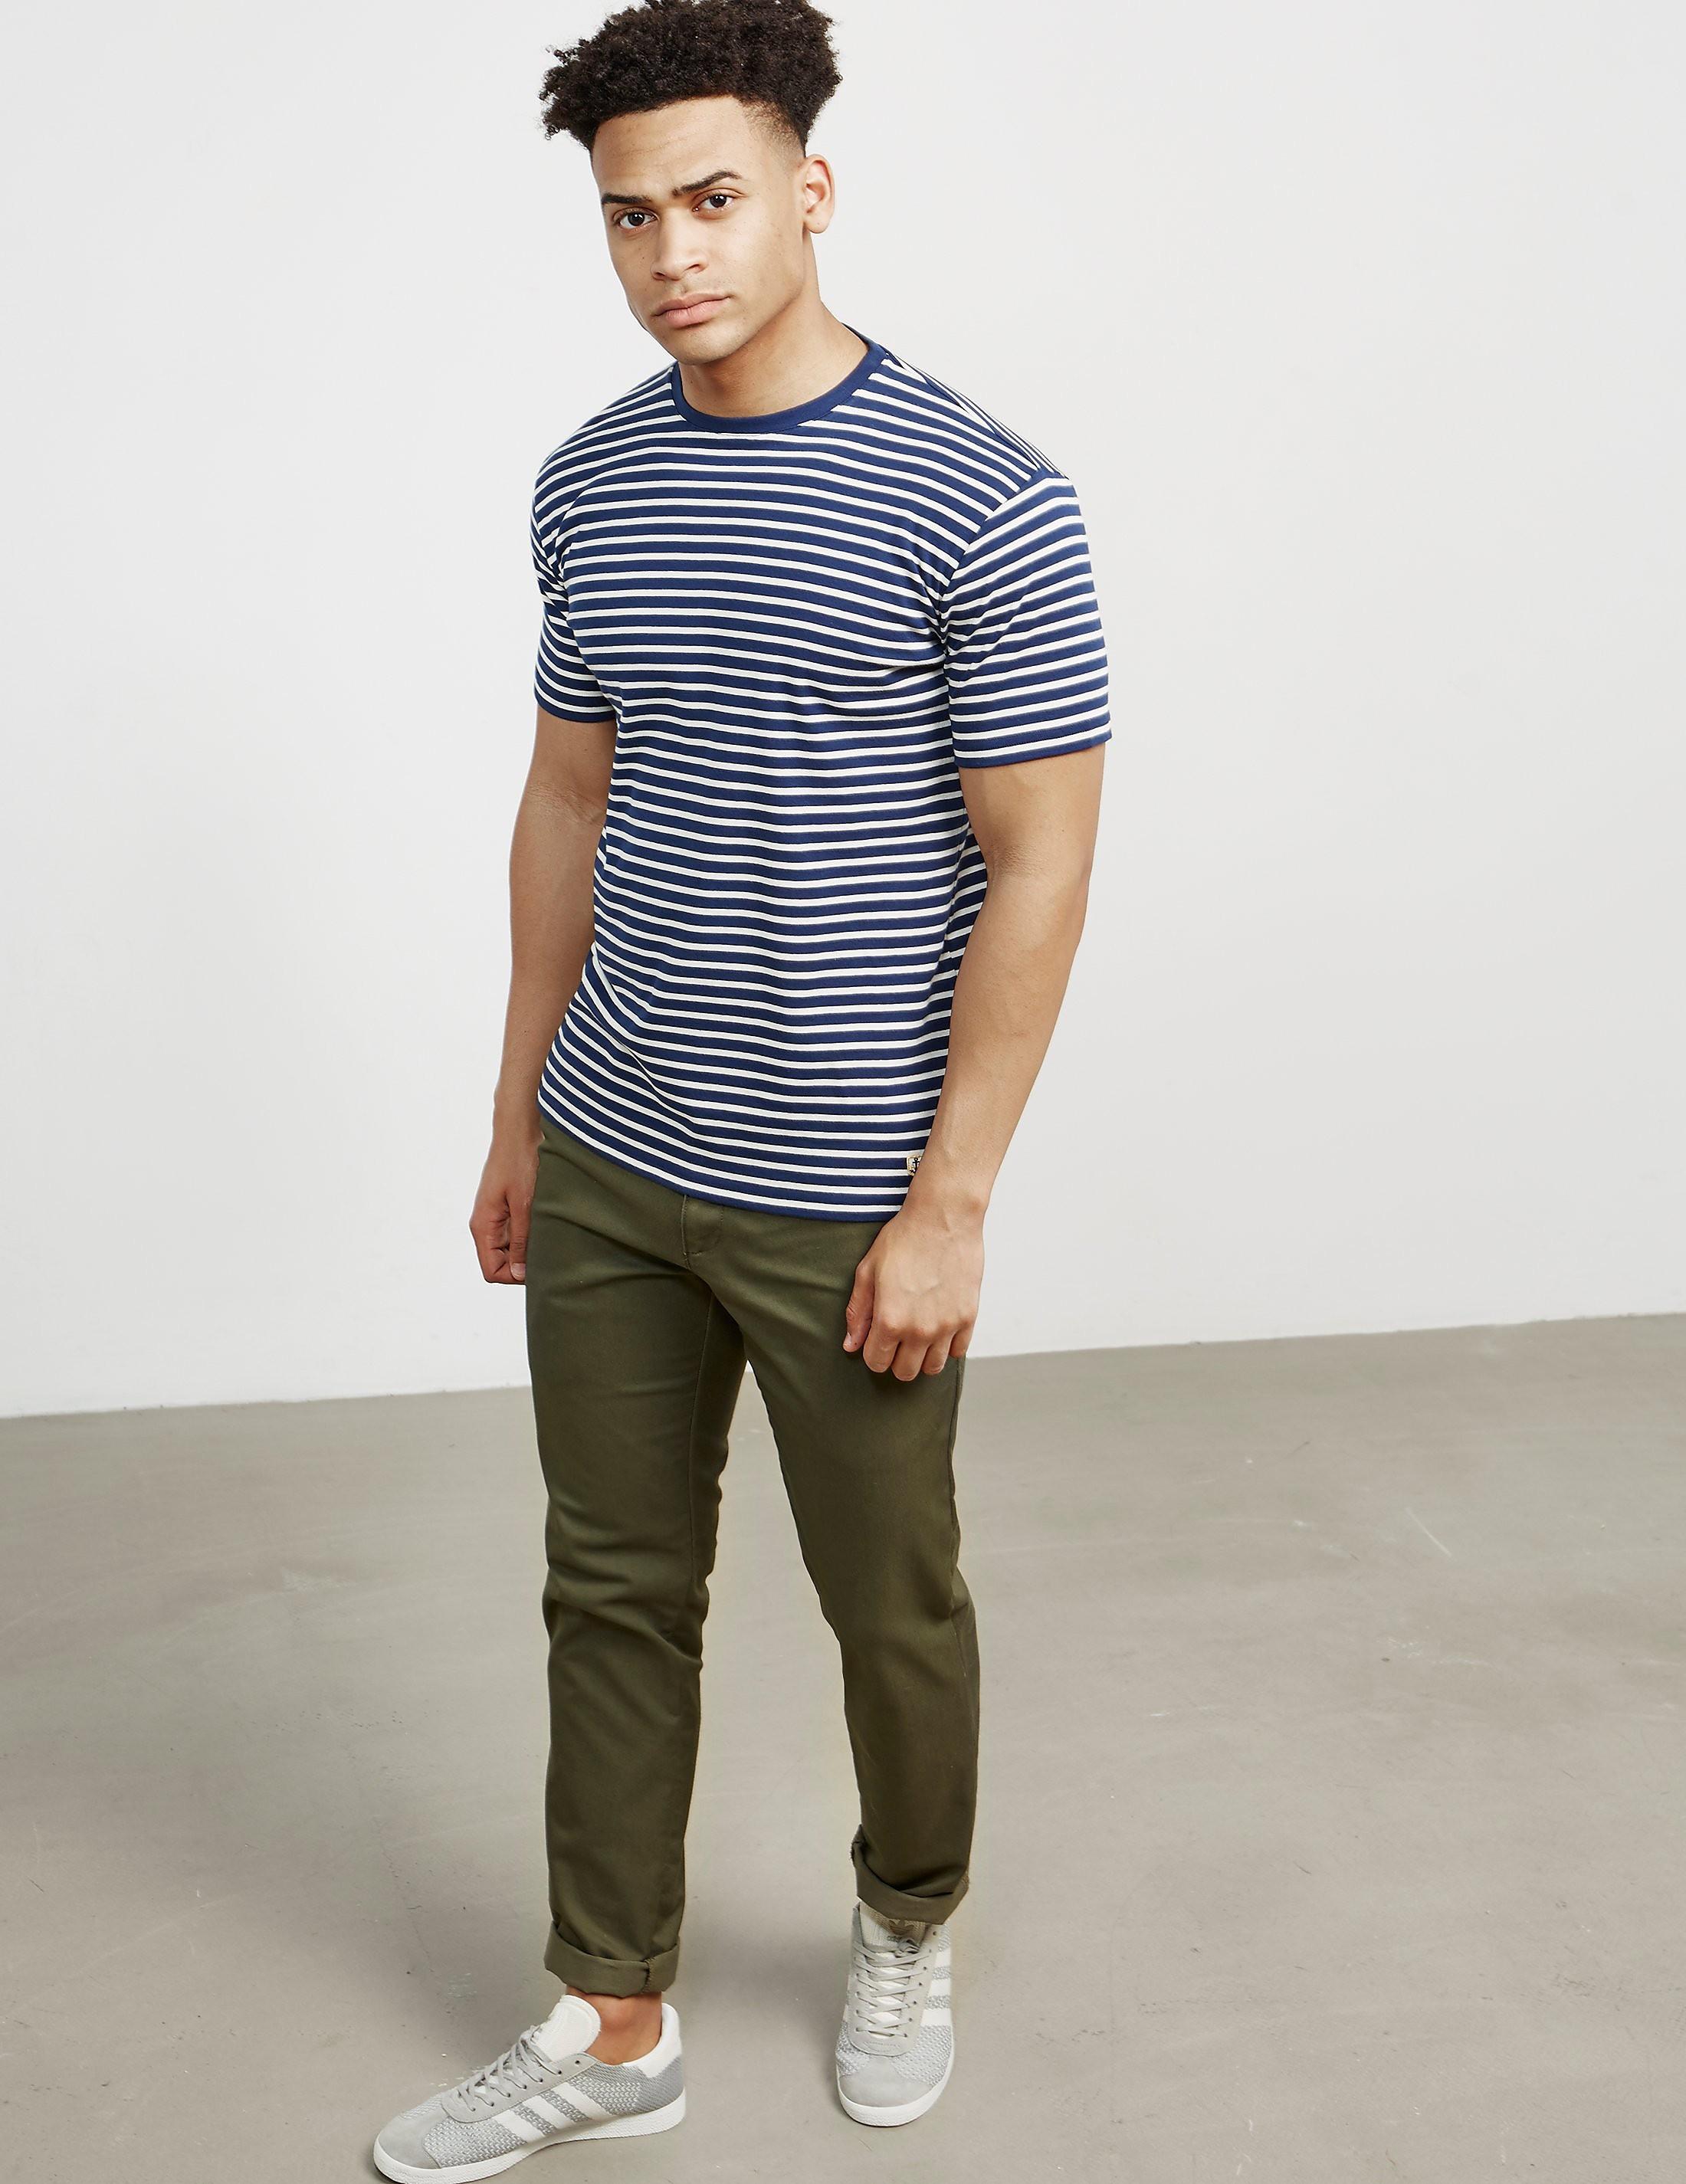 Armor Lux Stripe Heritage Short Sleeve T-Shirt